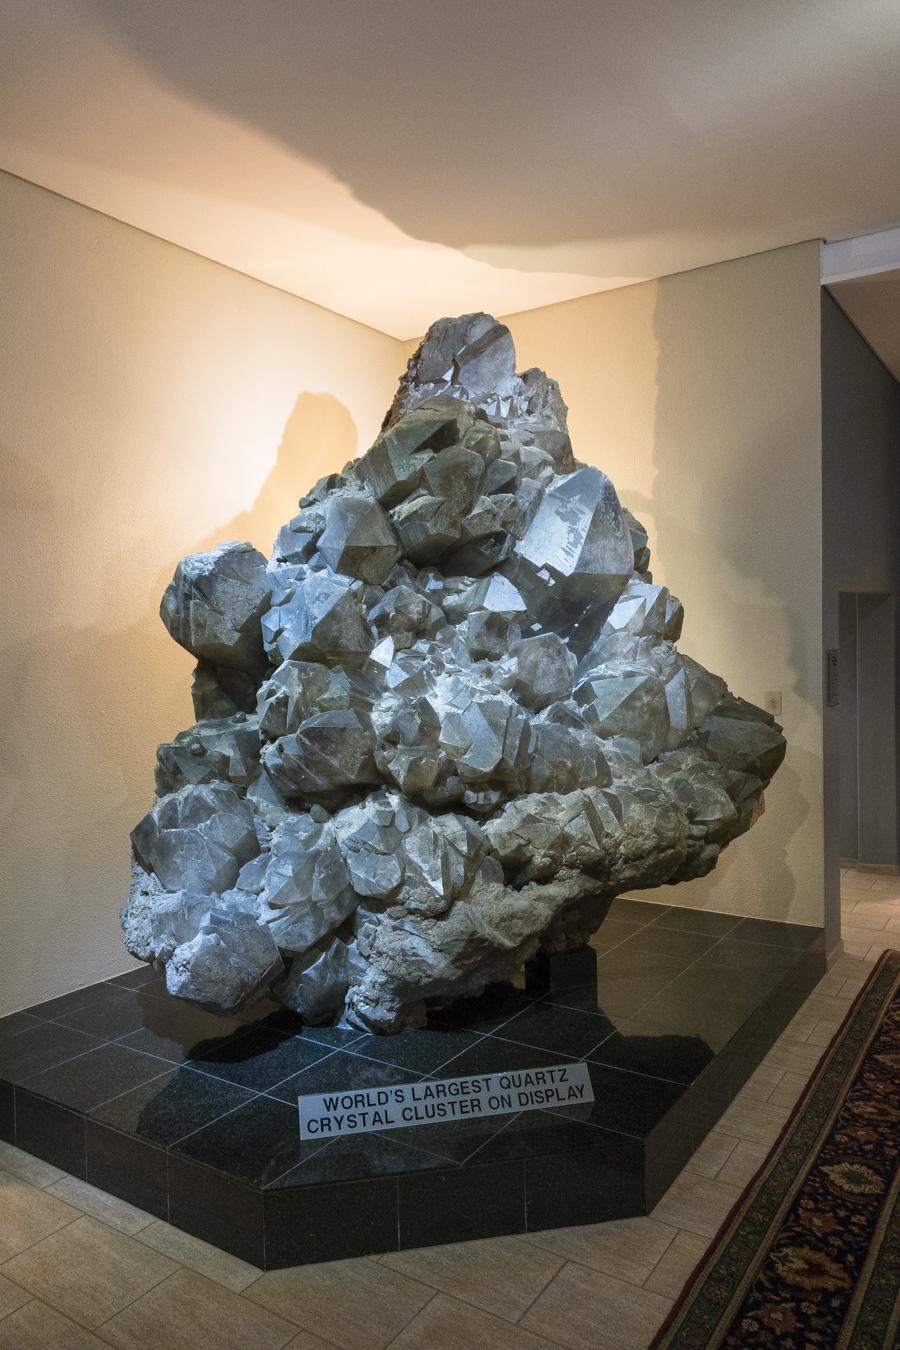 World's largest quartz crystal